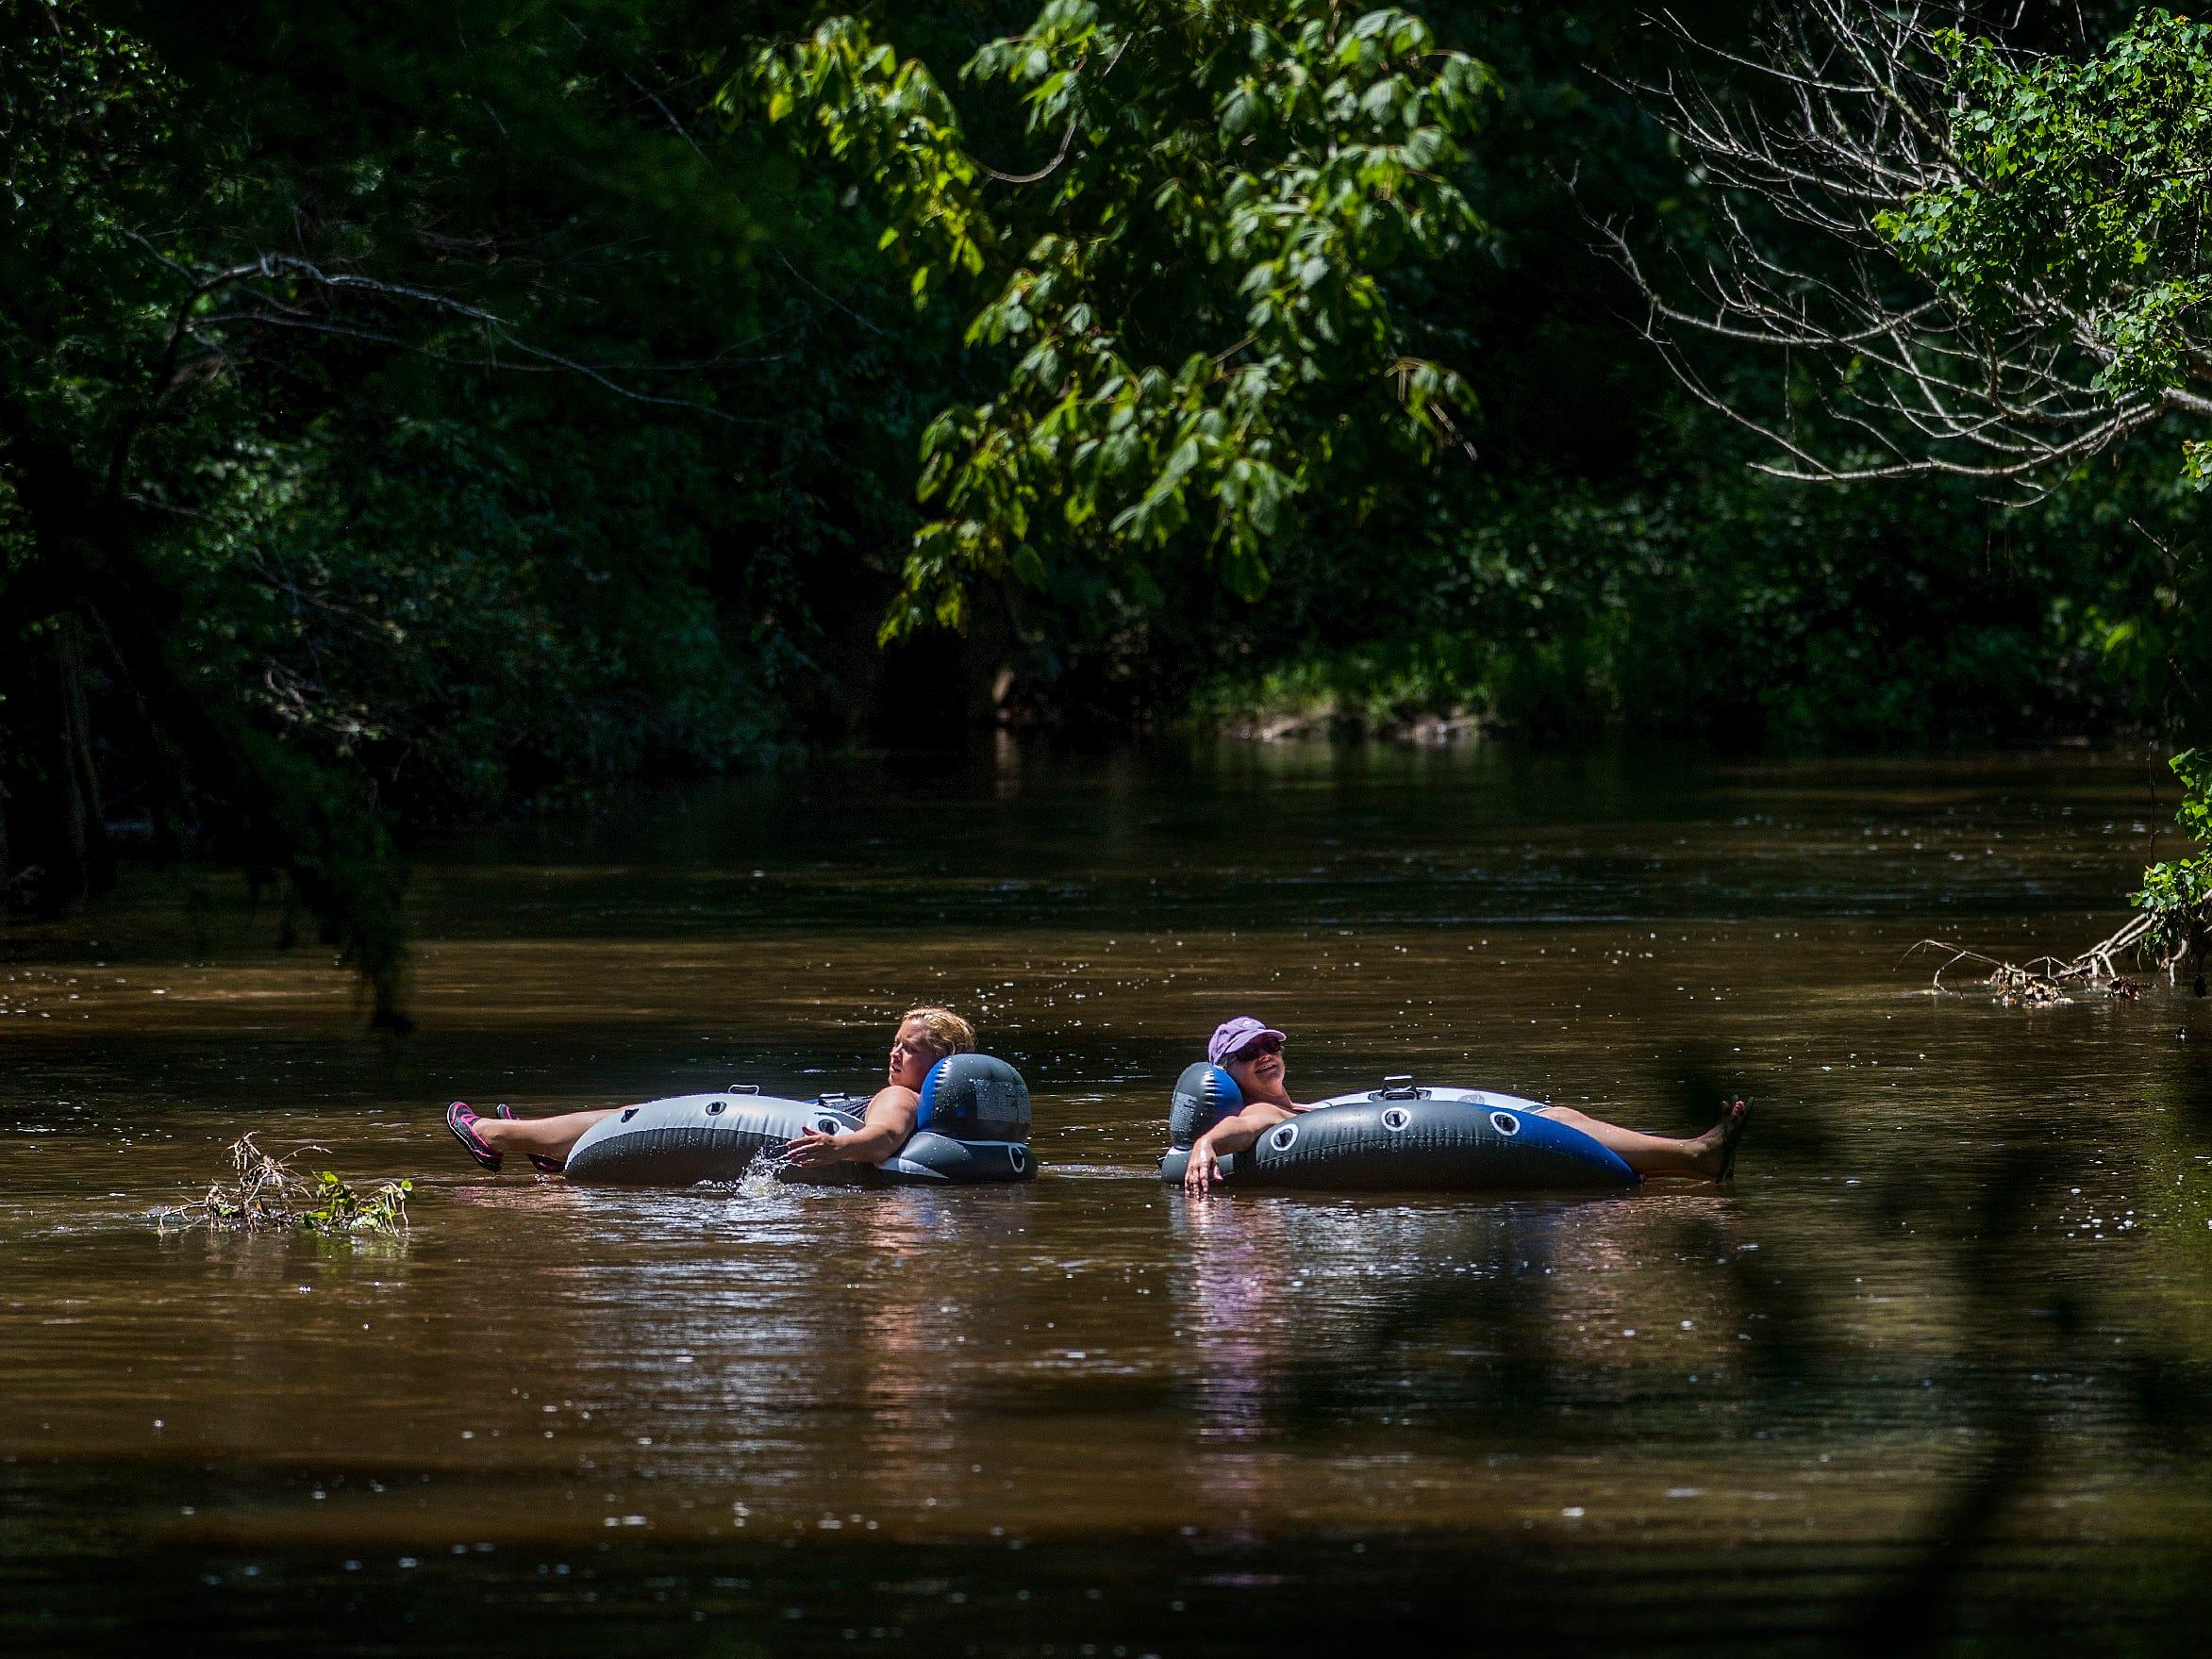 Shannon Eady and Karson Smith float on Autauga Creek in Prattville, Ala., on Saturday, July 21, 2018.